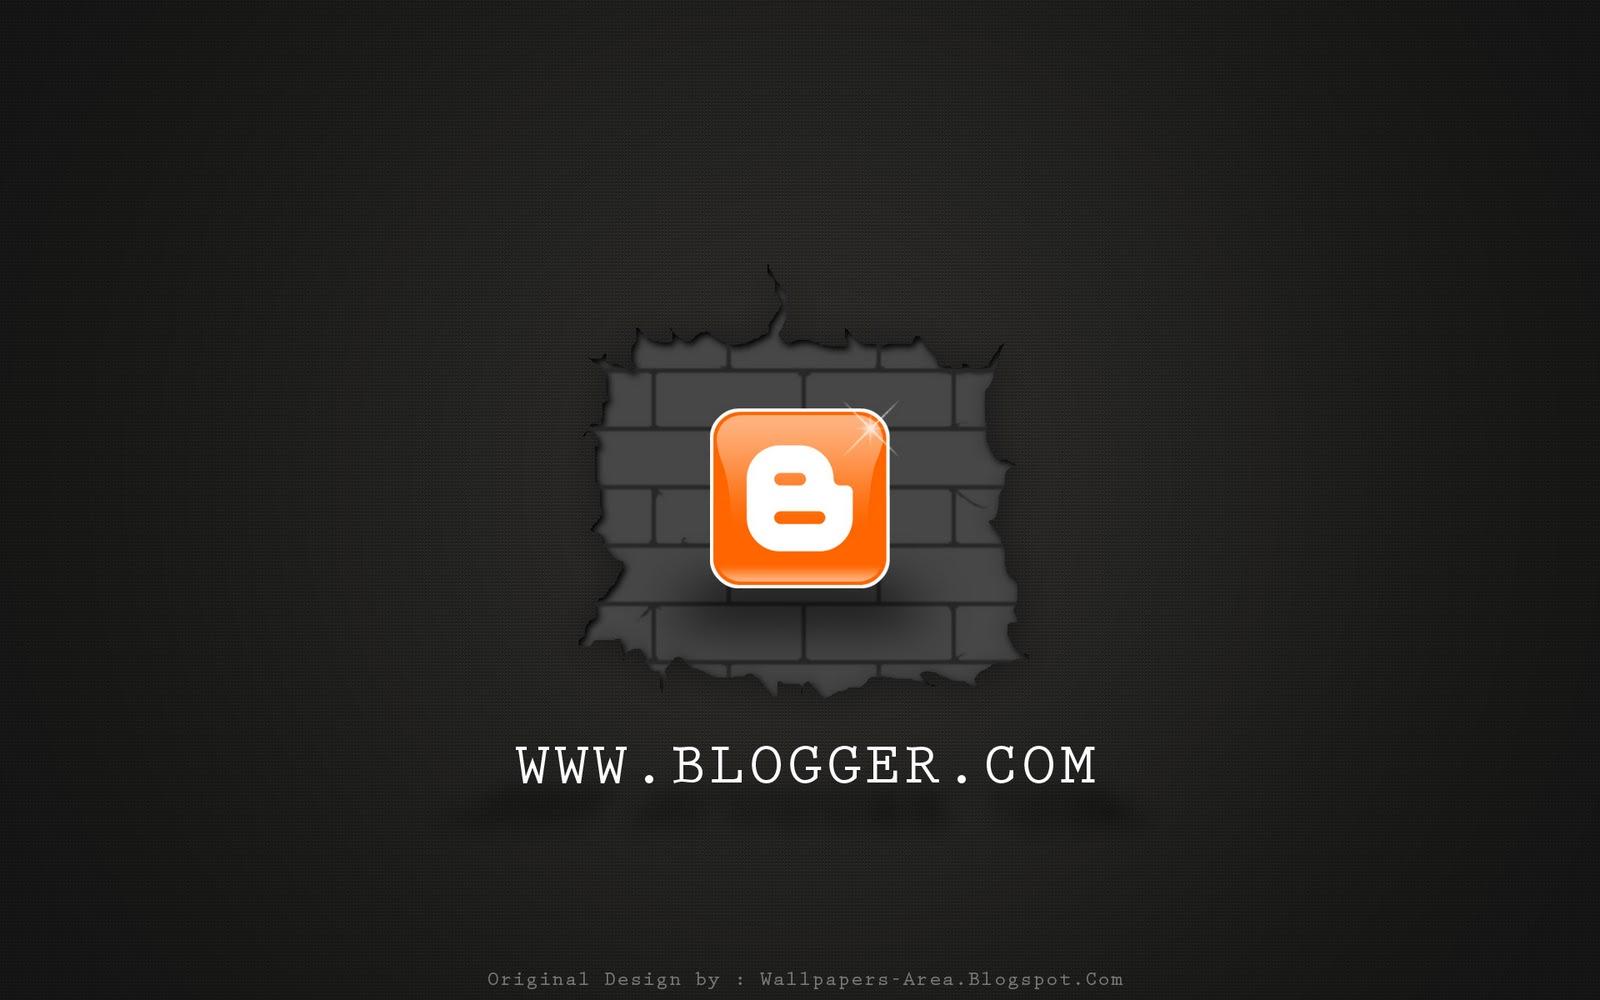 http://2.bp.blogspot.com/-o0ReE_i3bq8/Tu3_ex8EDJI/AAAAAAAAAWs/Z_uXdig-udI/s1600/crack+Bloggger+Wallpapers.jpg